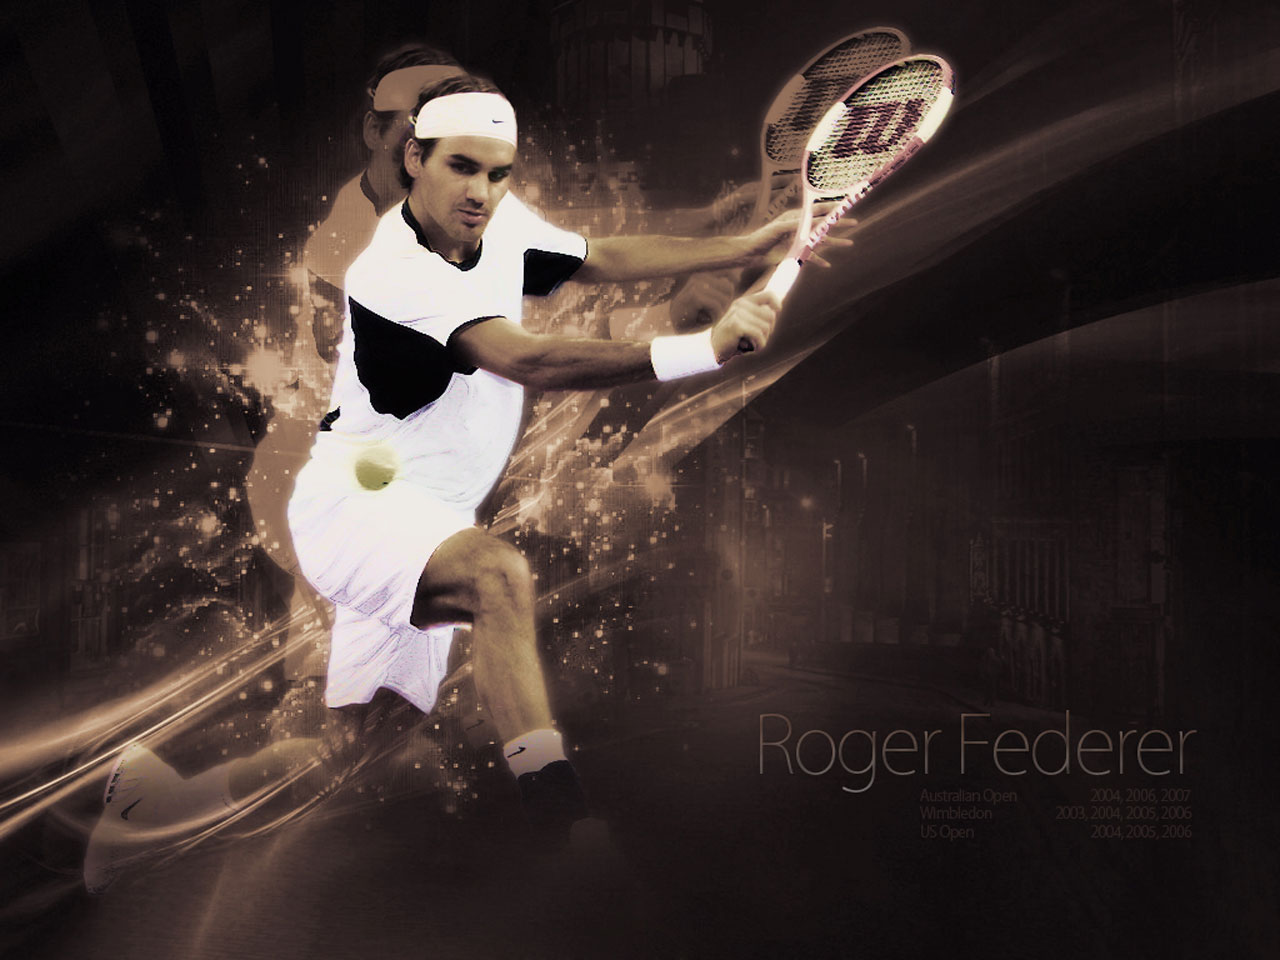 http://1.bp.blogspot.com/-_aHO08uLQ8k/UAk_wKH5-XI/AAAAAAAADBs/HqIrWQwk3_4/s1600/Roger+Federer+hd+Wallpape_2.jpg